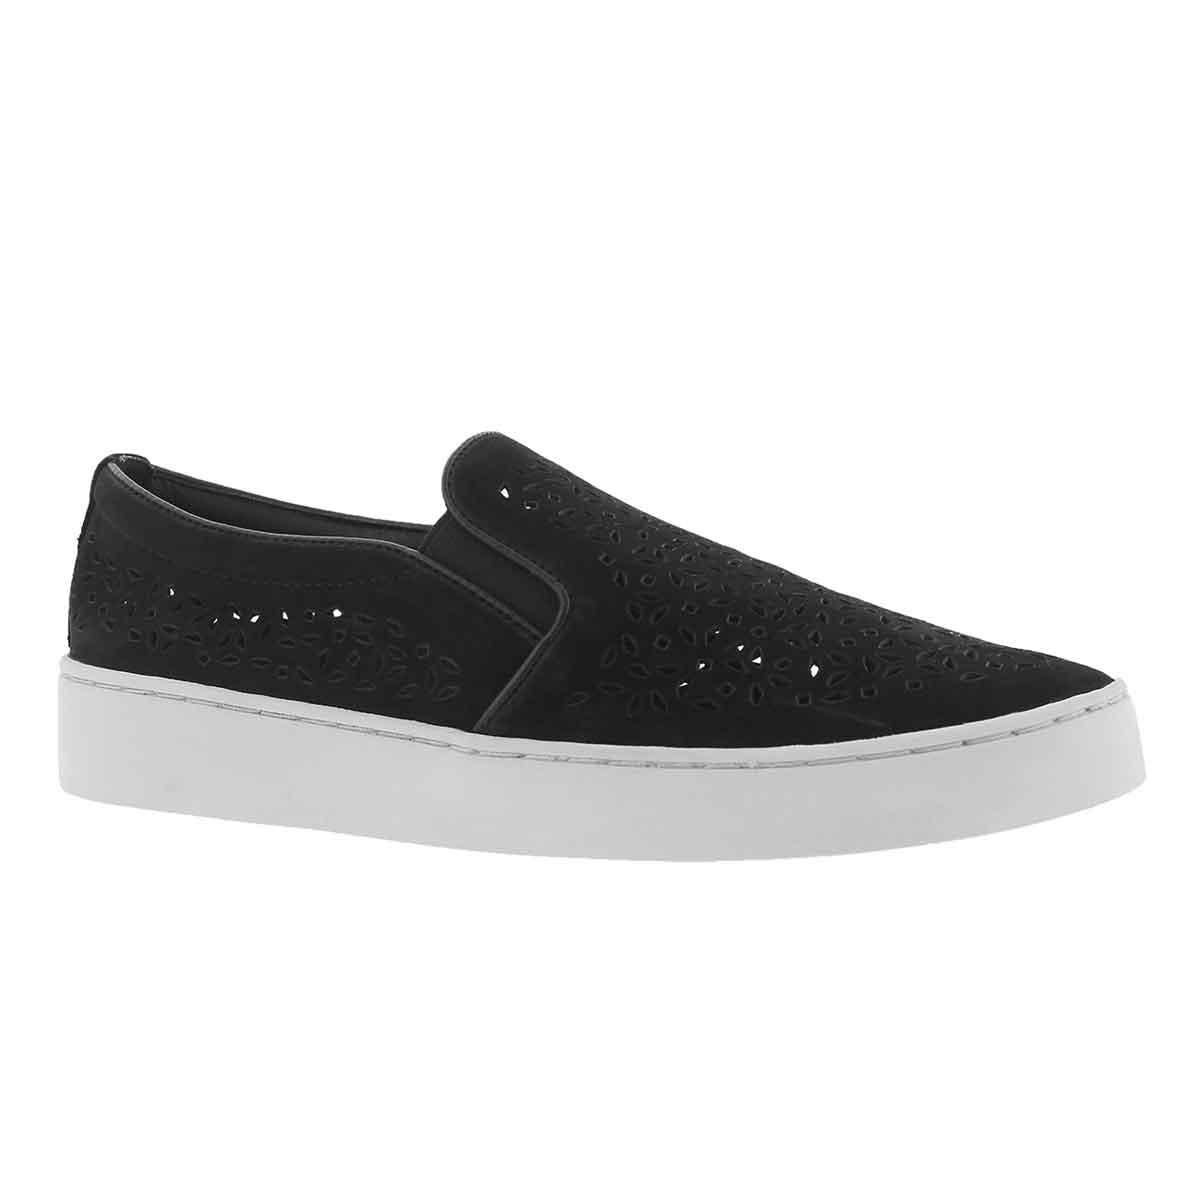 Women's MIDI PERF black casual slip on shoes